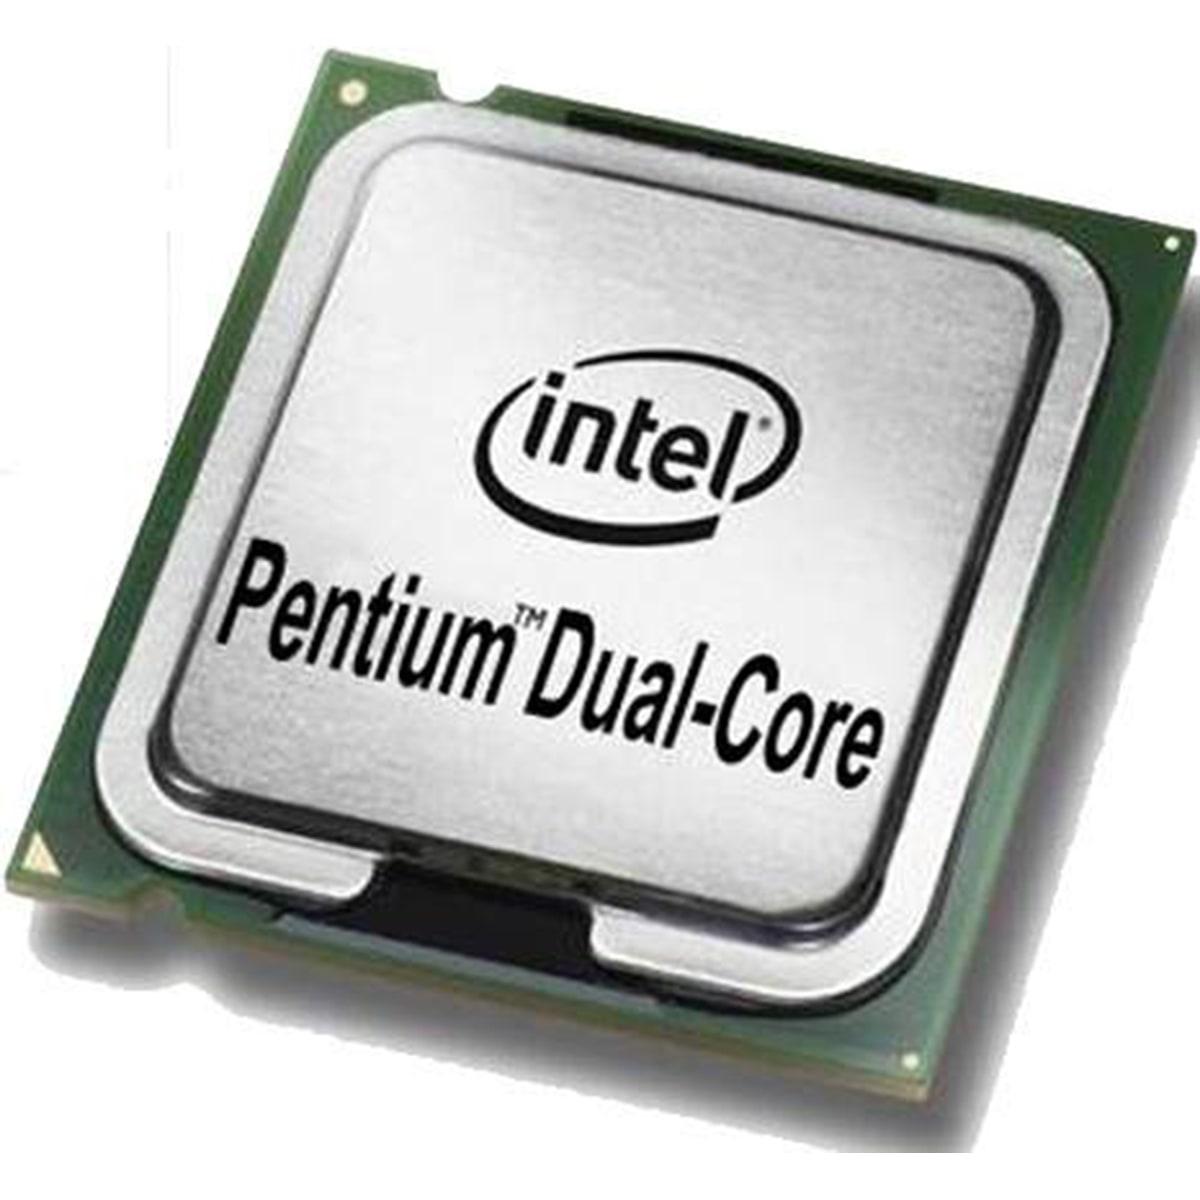 Processador Intel Dual Core E5700 3,00Ghz 2M Cache 800 MHz Socket 775 - Seminovo